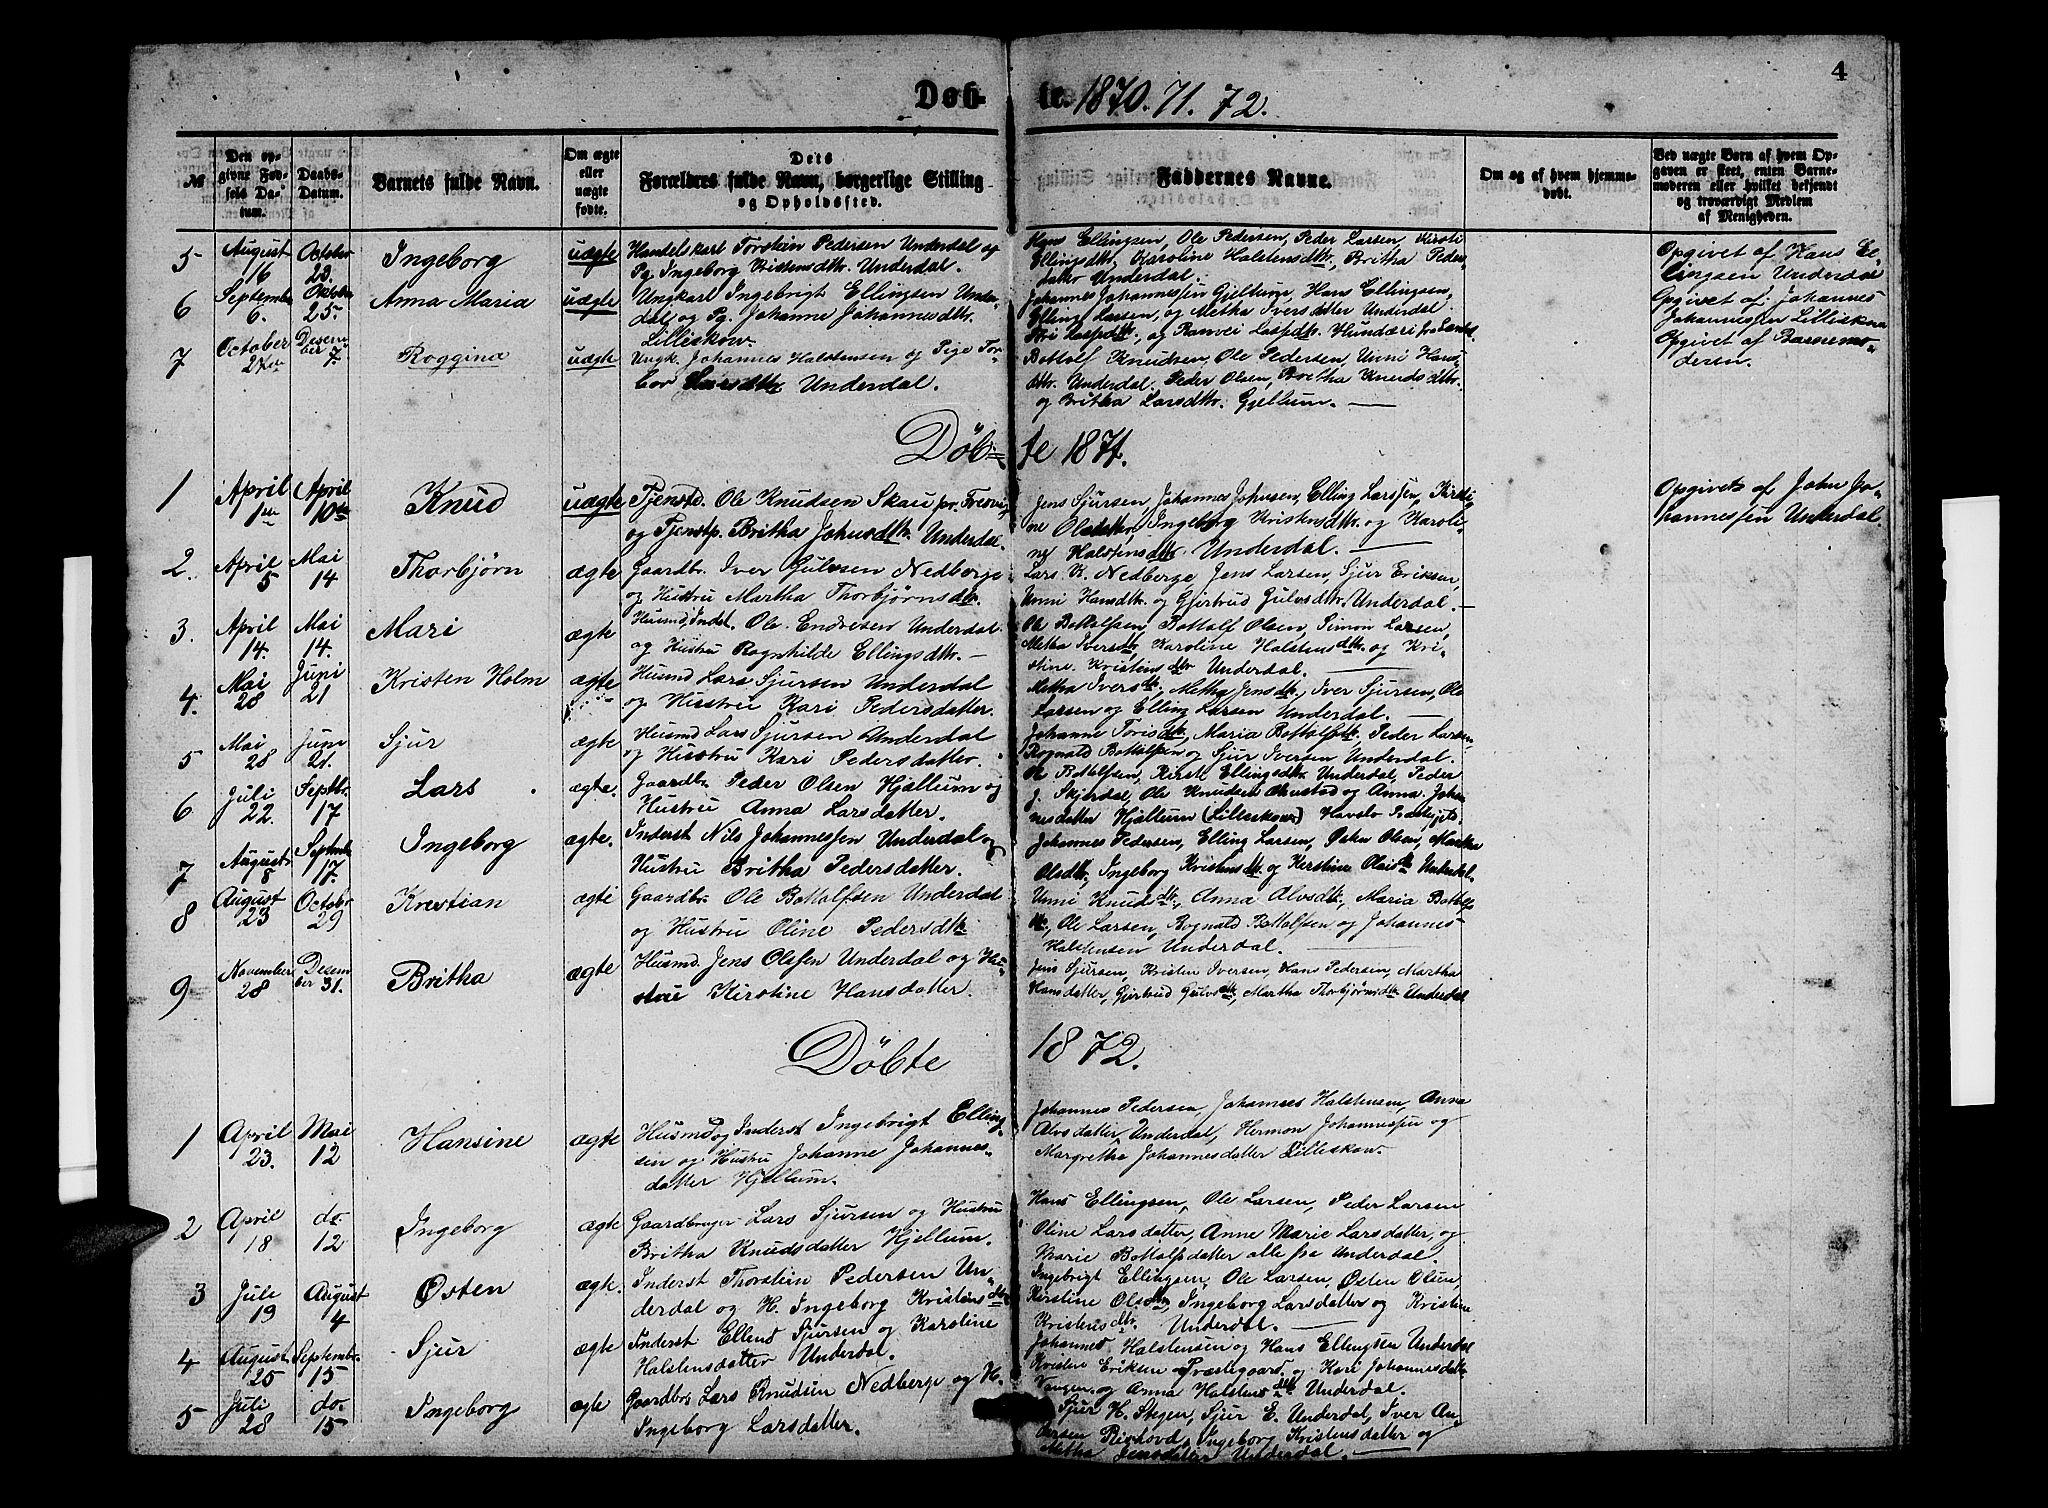 SAB, Aurland Sokneprestembete*, Klokkerbok nr. D 1, 1868-1882, s. 4